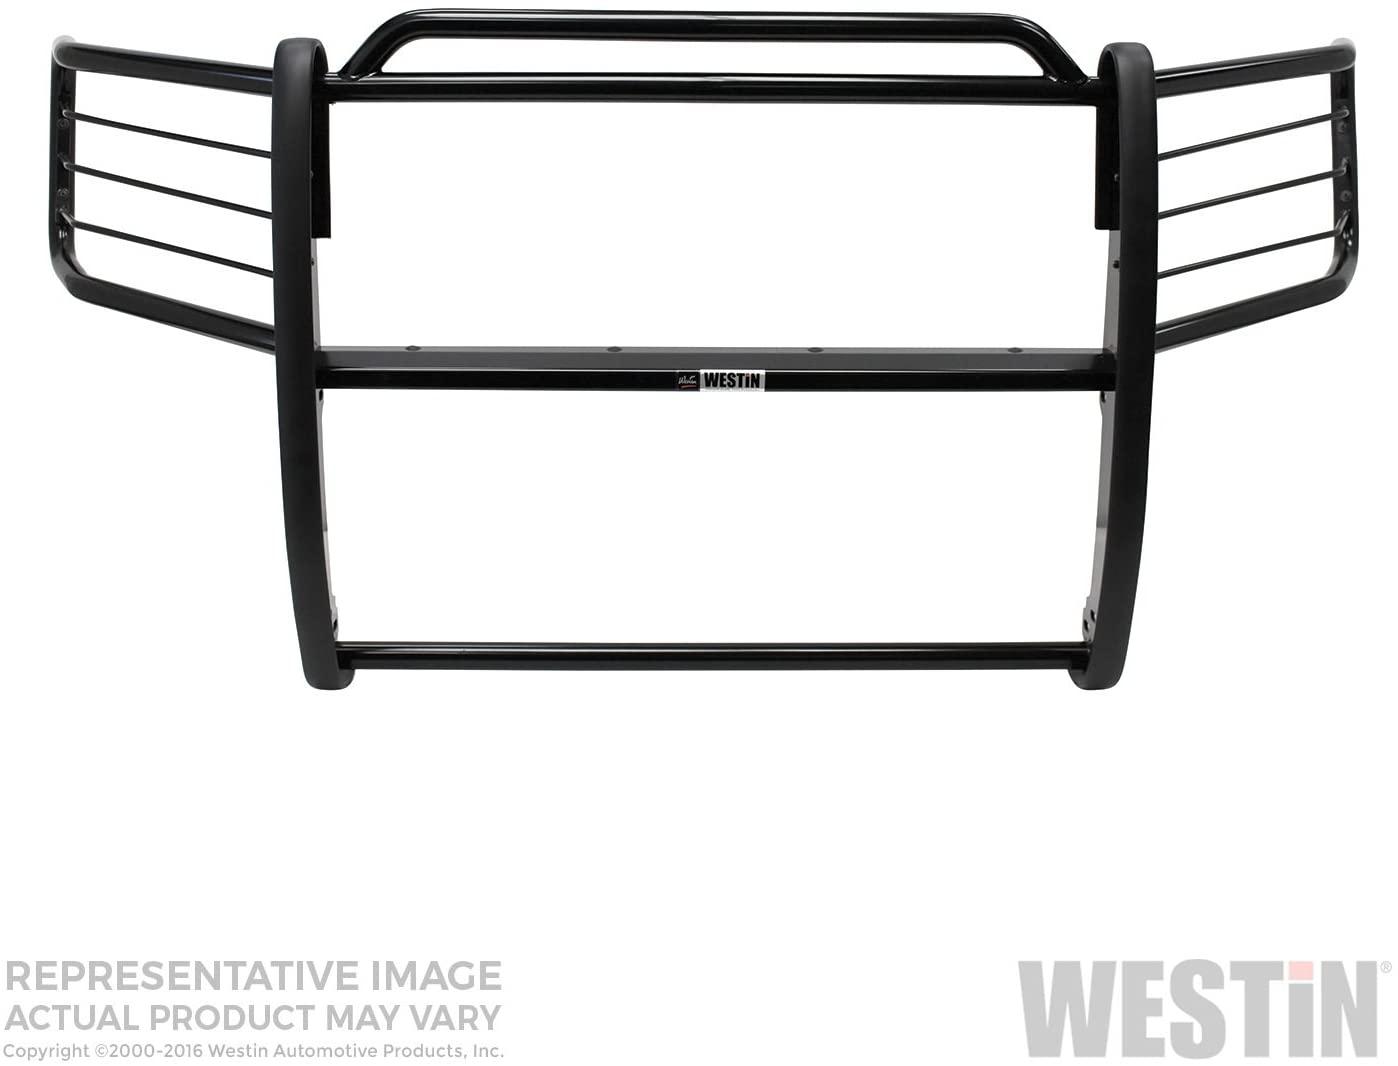 Westin 40-0125 Sportsman Tough Black Powdercoat Finish Steel Grille Guard - 1 Piece